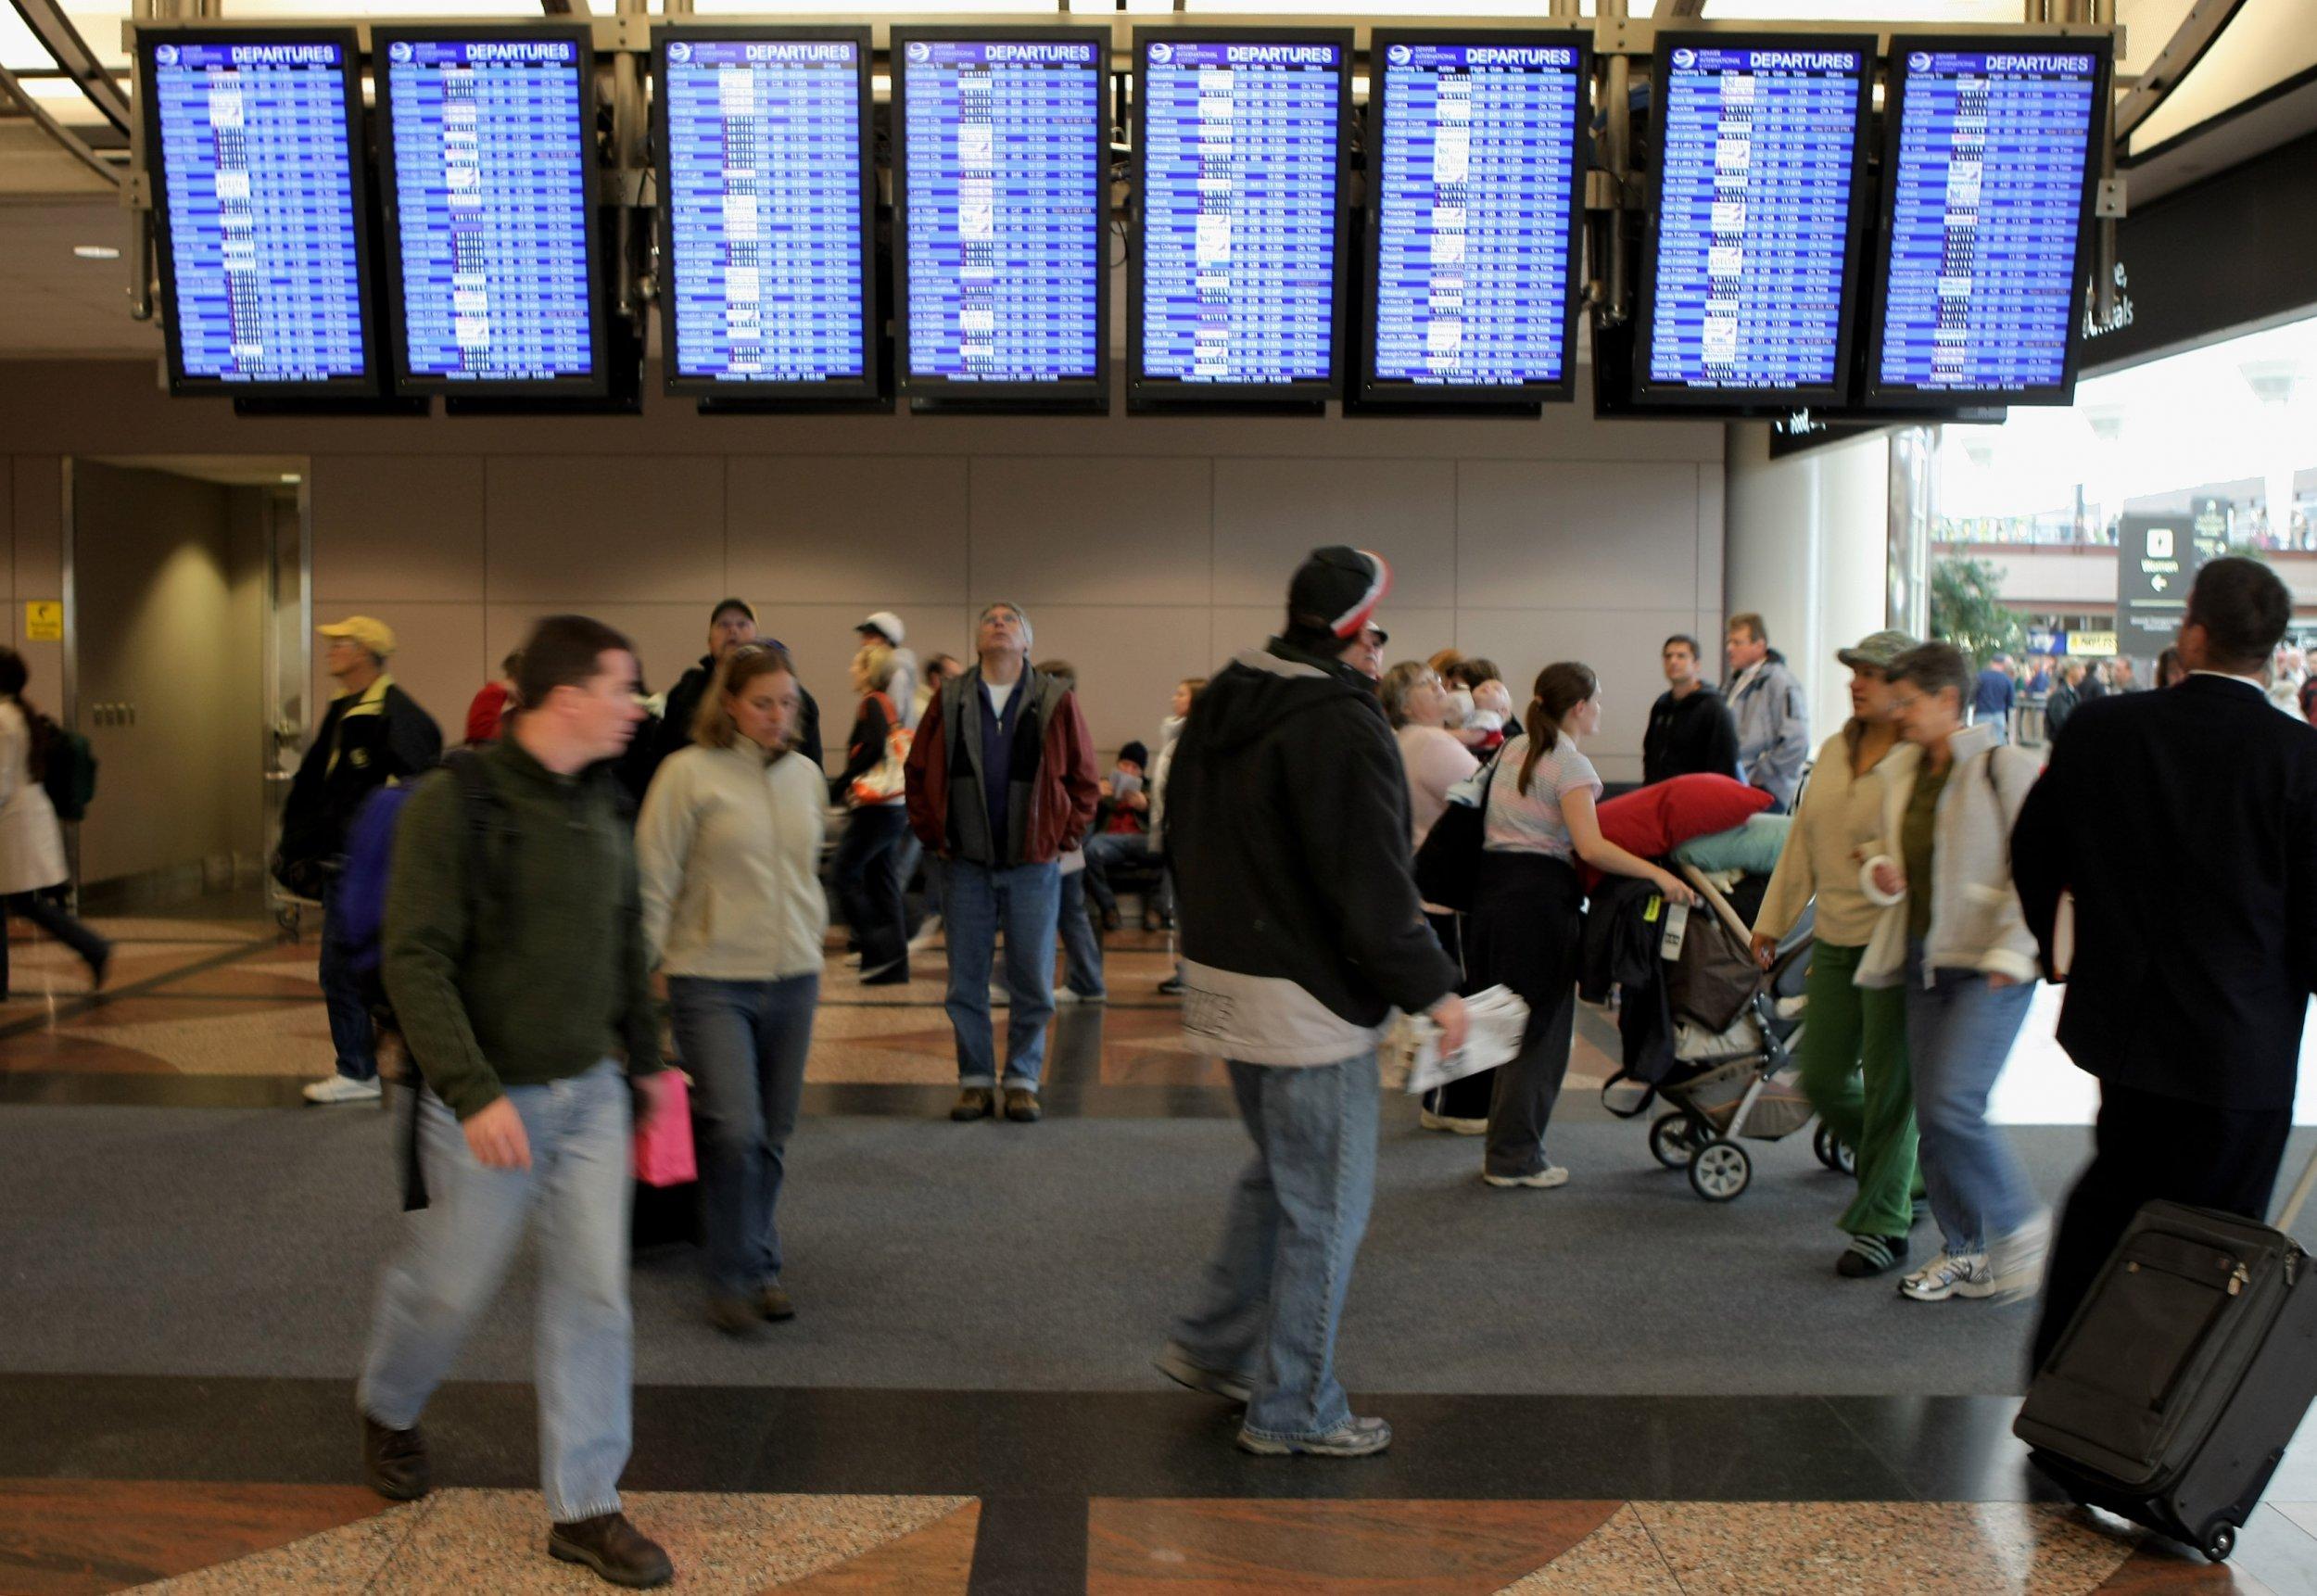 denver international airport flight cancellations southwest travel waivers